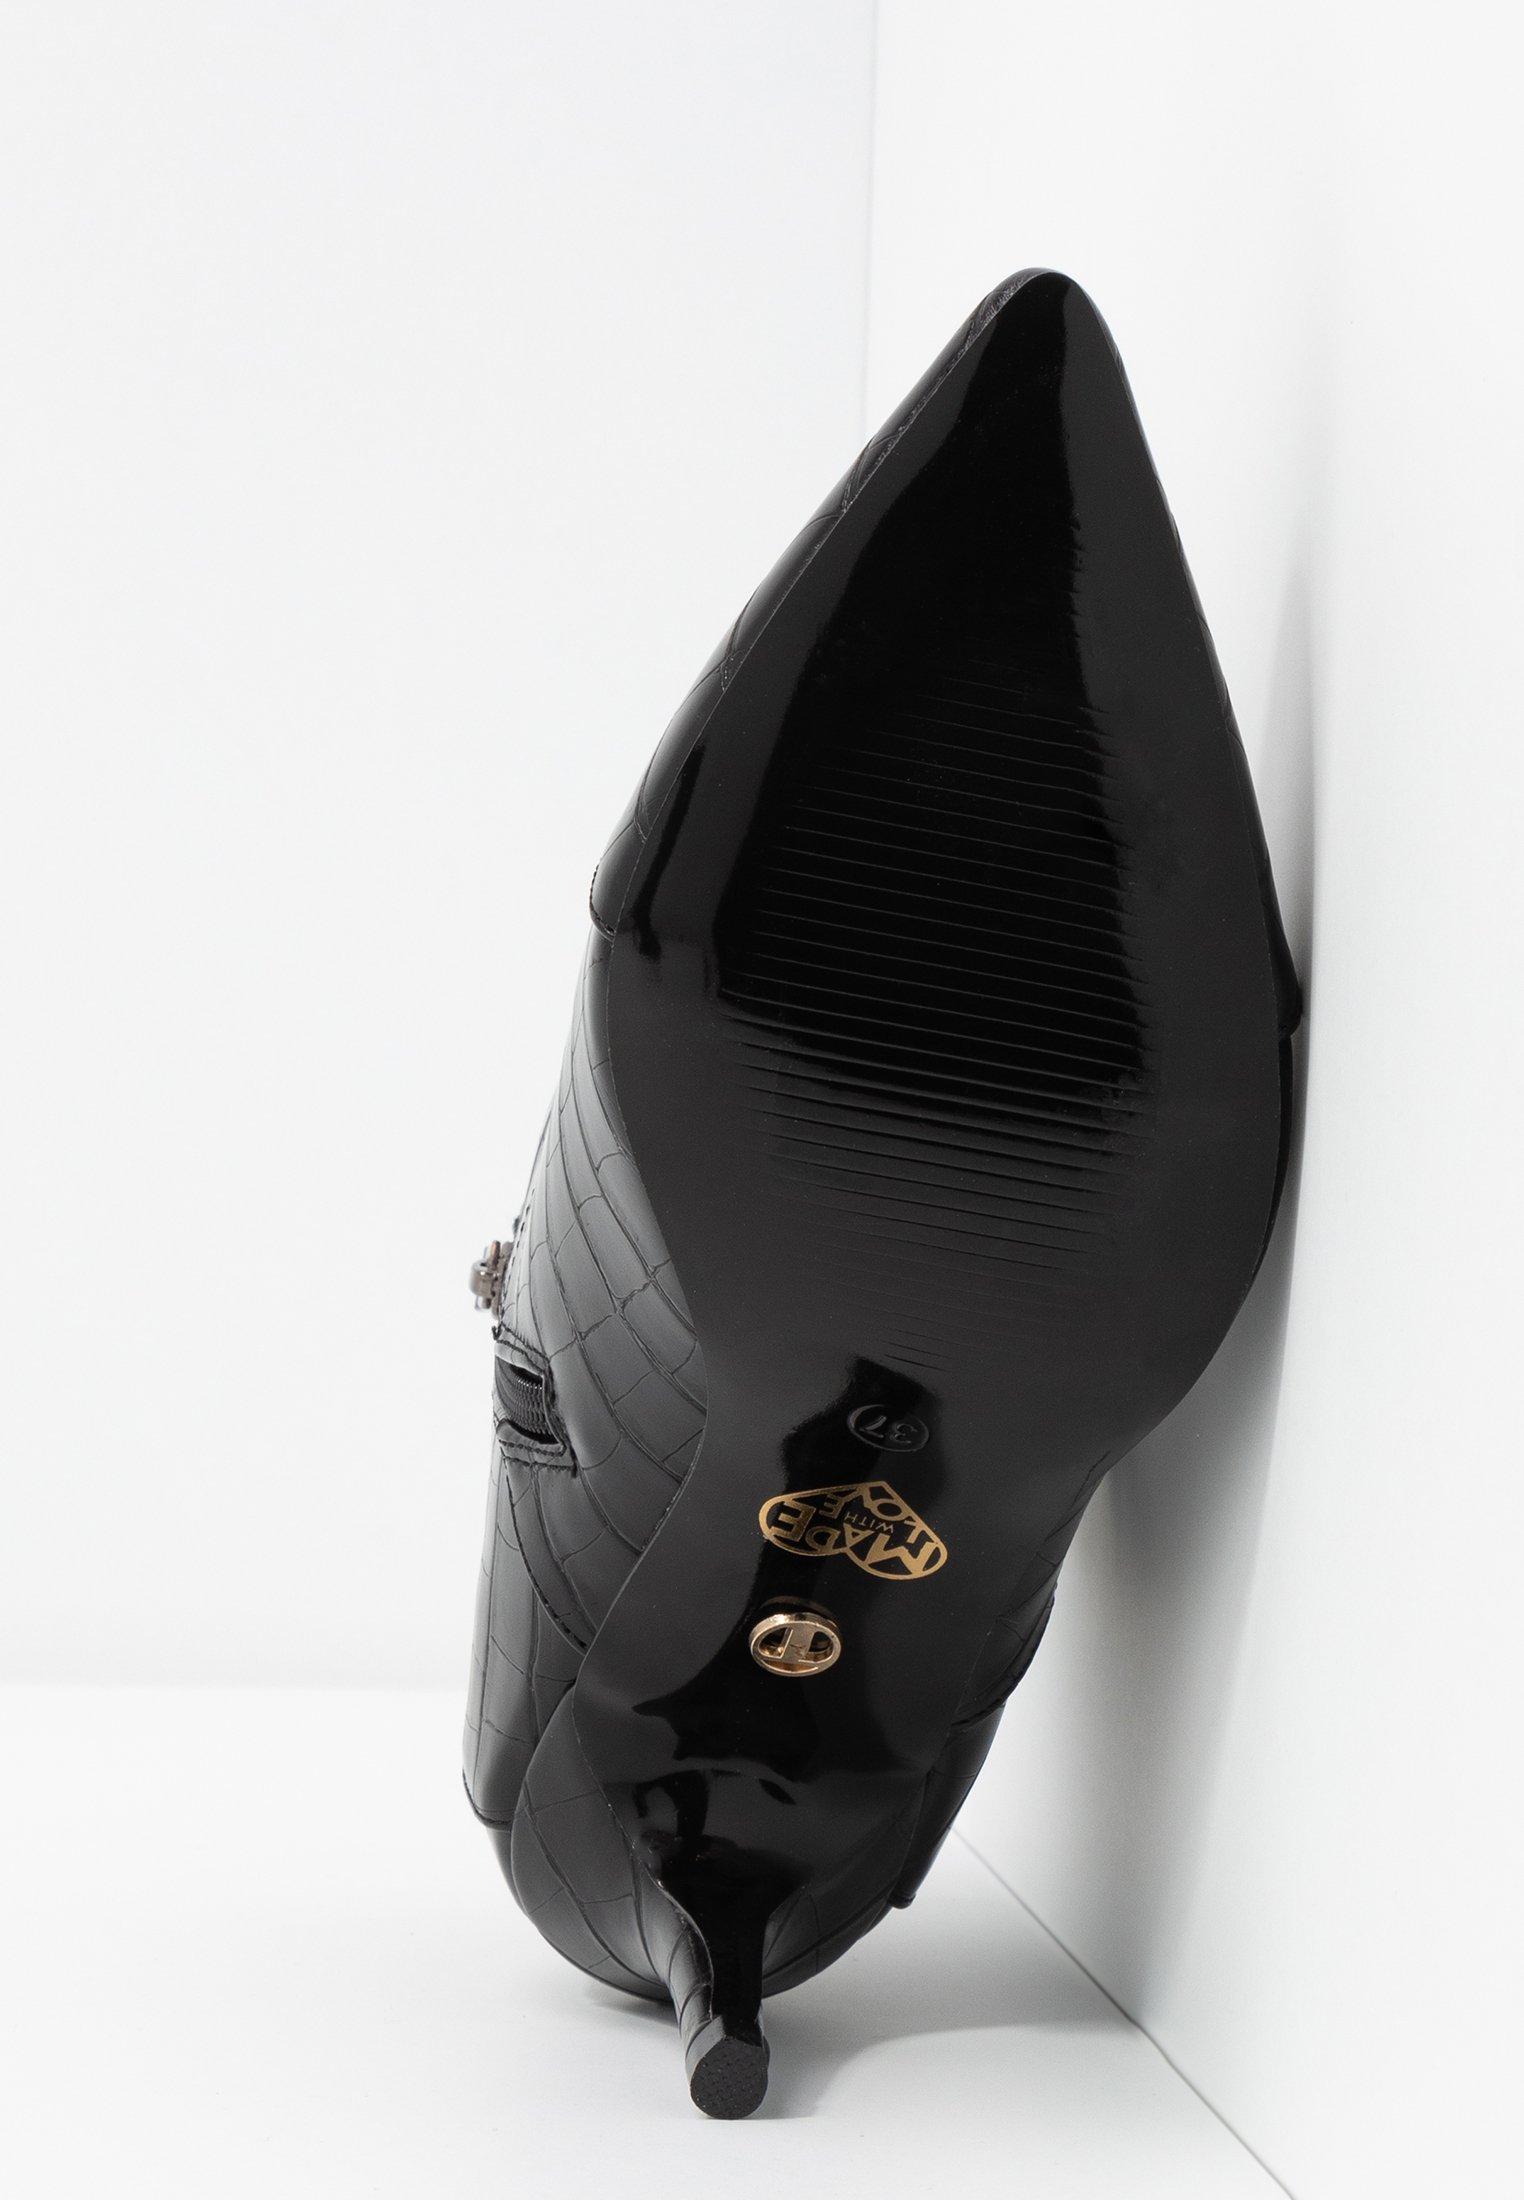 Black Black Tronchetti Italia Tata Italia Tata Tata Tronchetti 2EIDH9